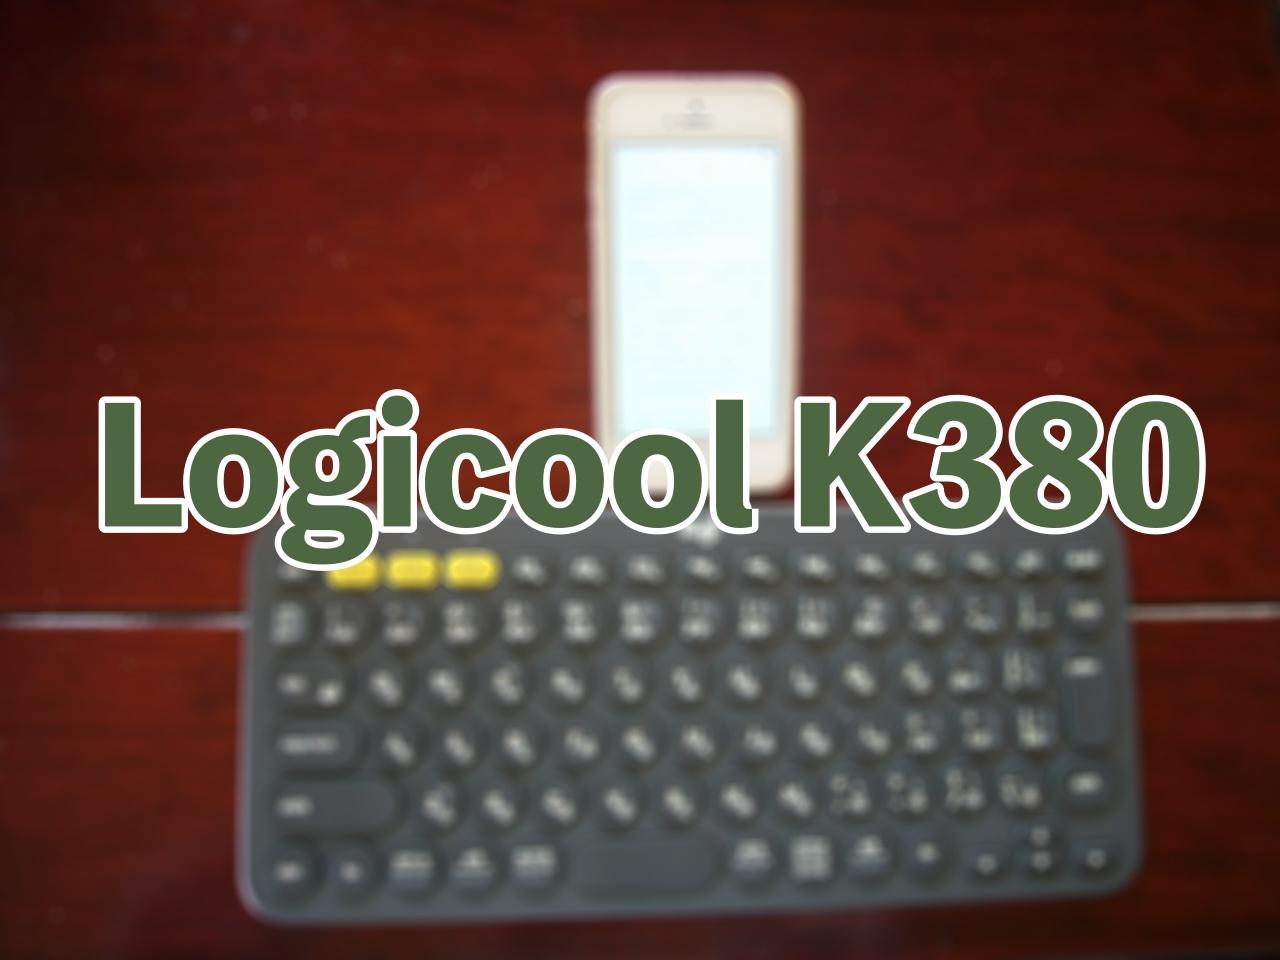 logicool-k380-title